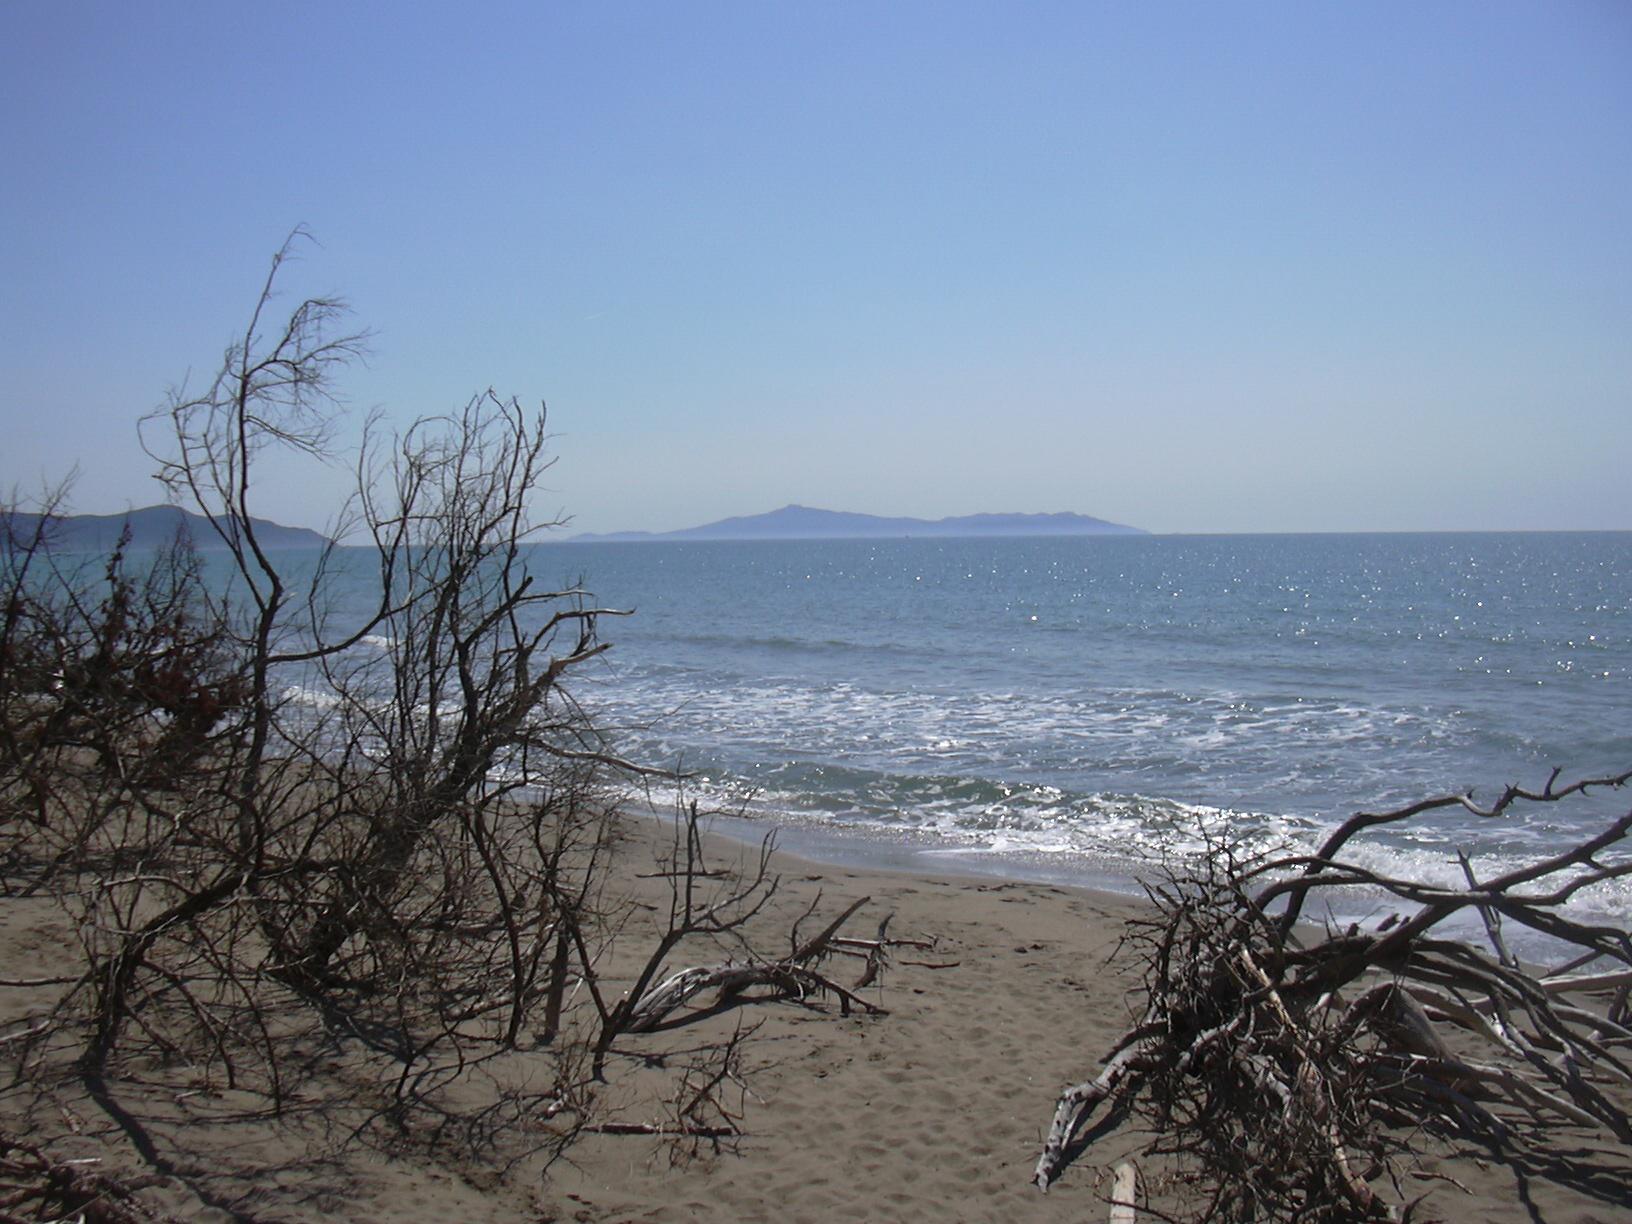 Parco Naturale delle Maremma, beach